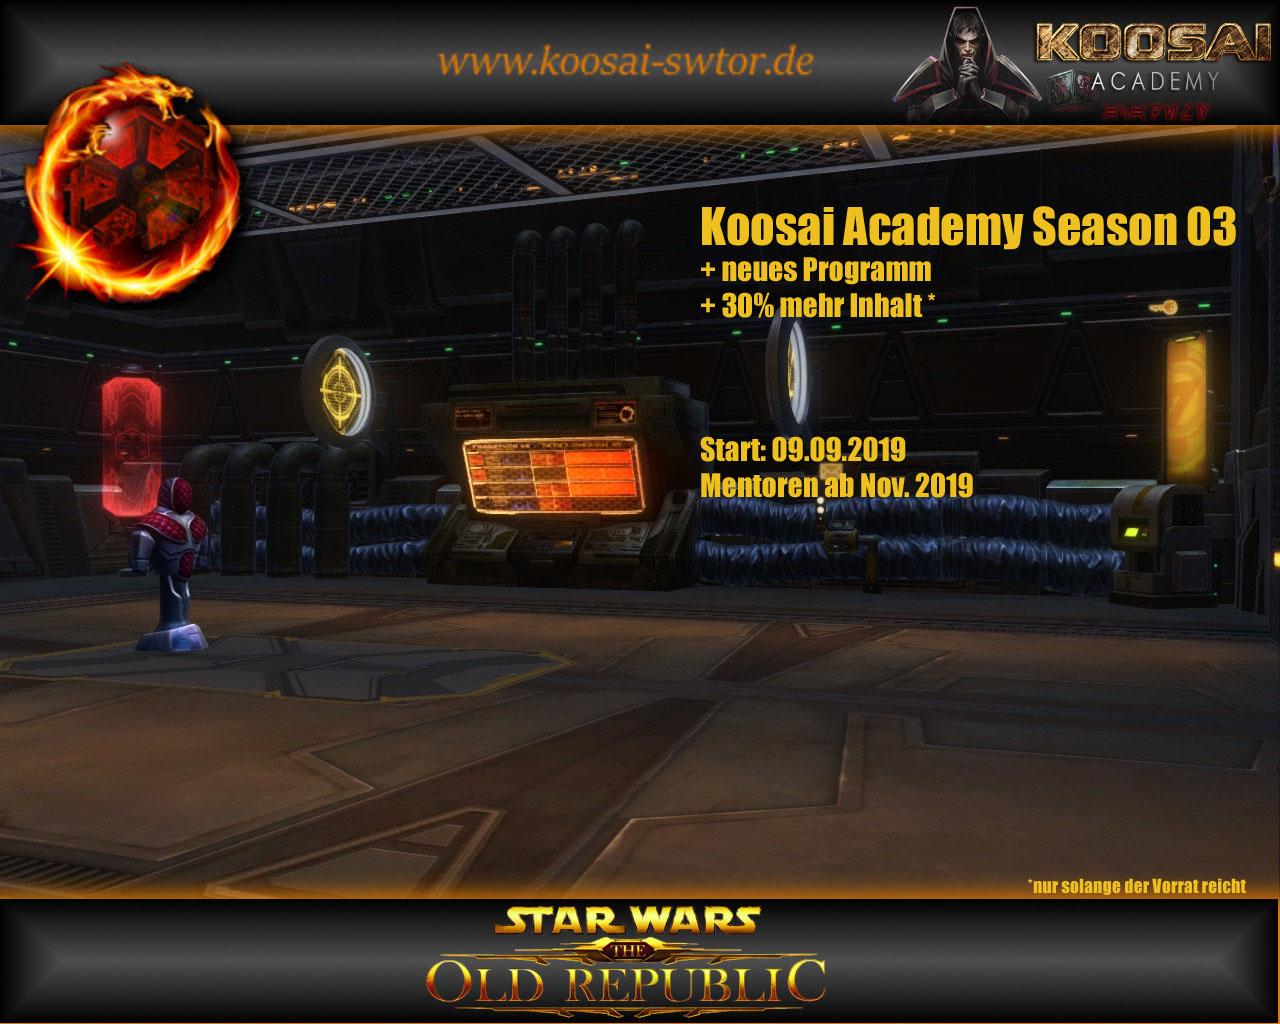 Koosai Academy Season 03